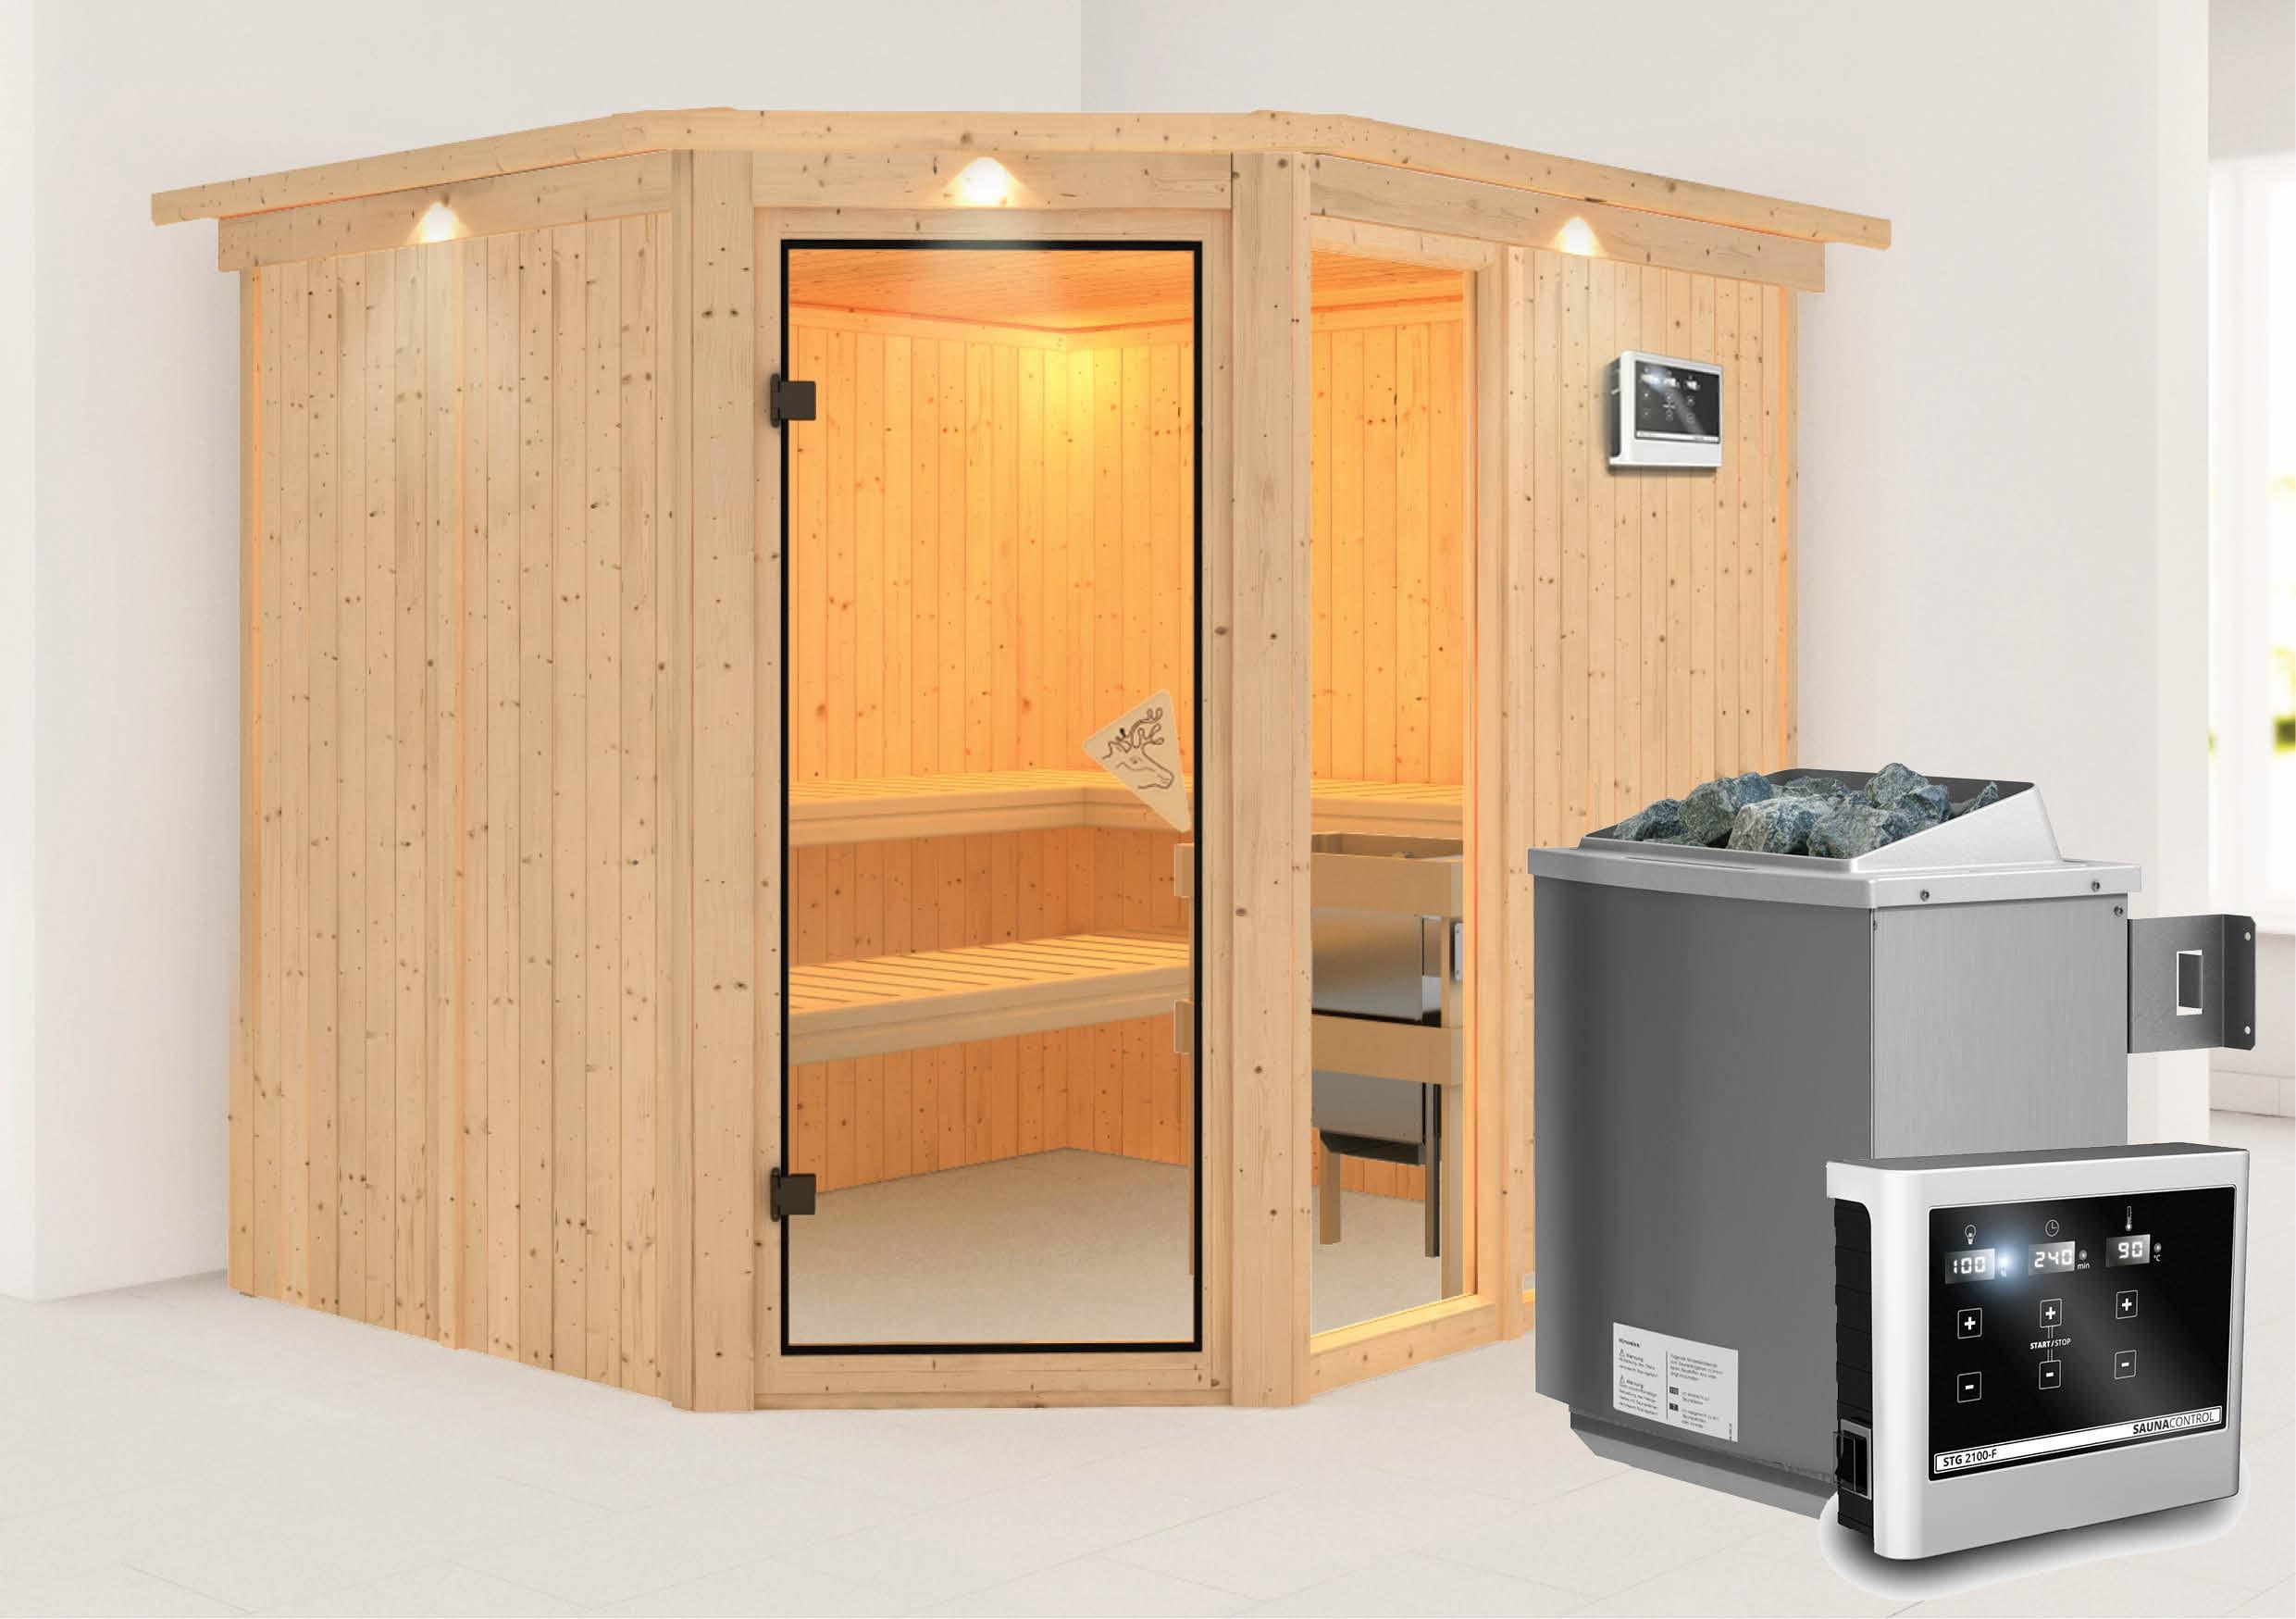 Karibu Sauna Fiona 3 68mm Dachkranz + Ofen 9kW extern classic Tür Bild 1